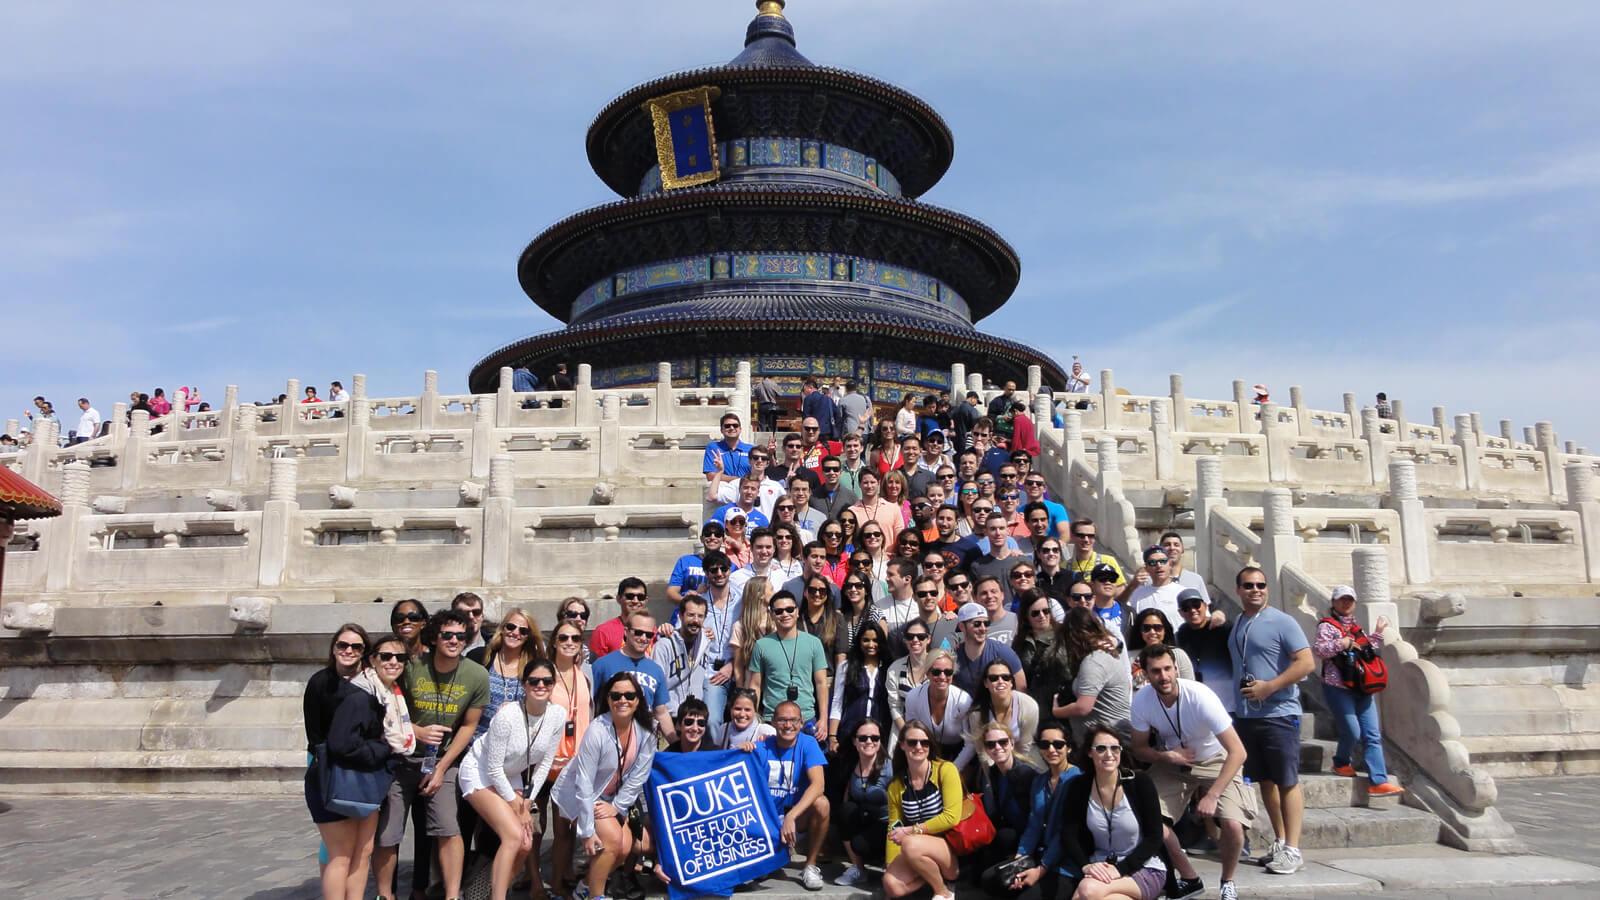 Duke Fuqua MBA students study in China